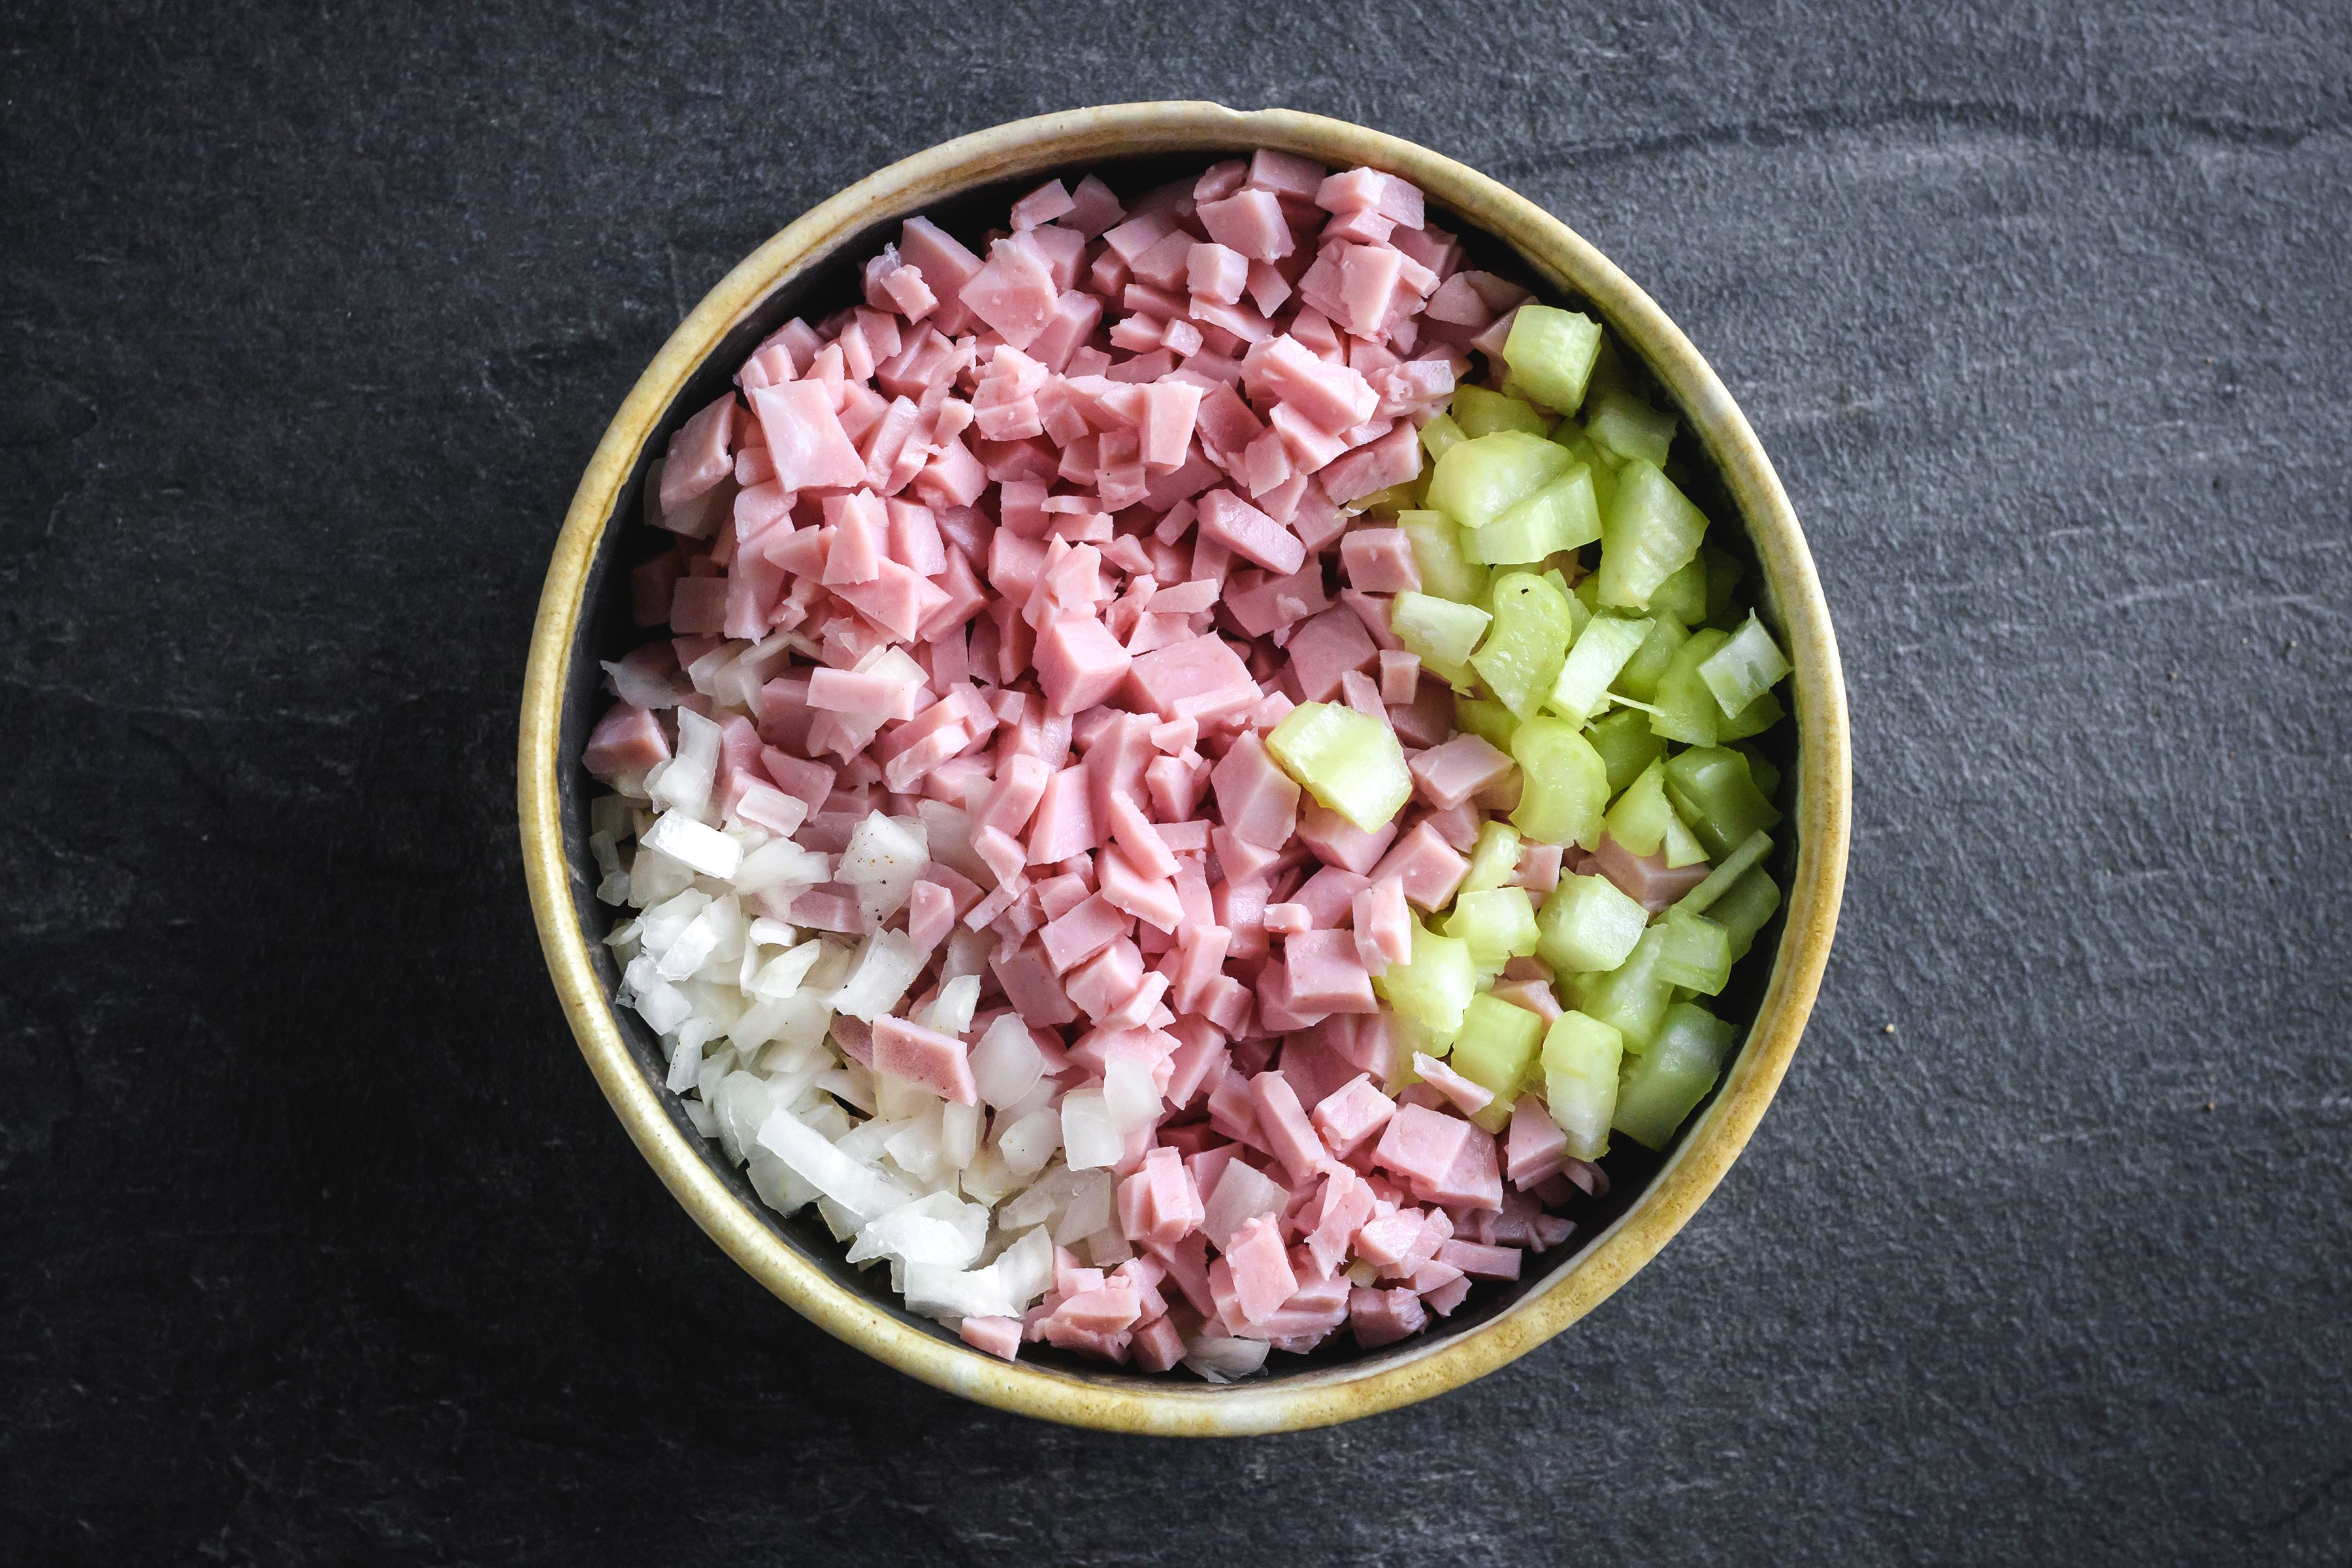 Mix together ham, celery, onion